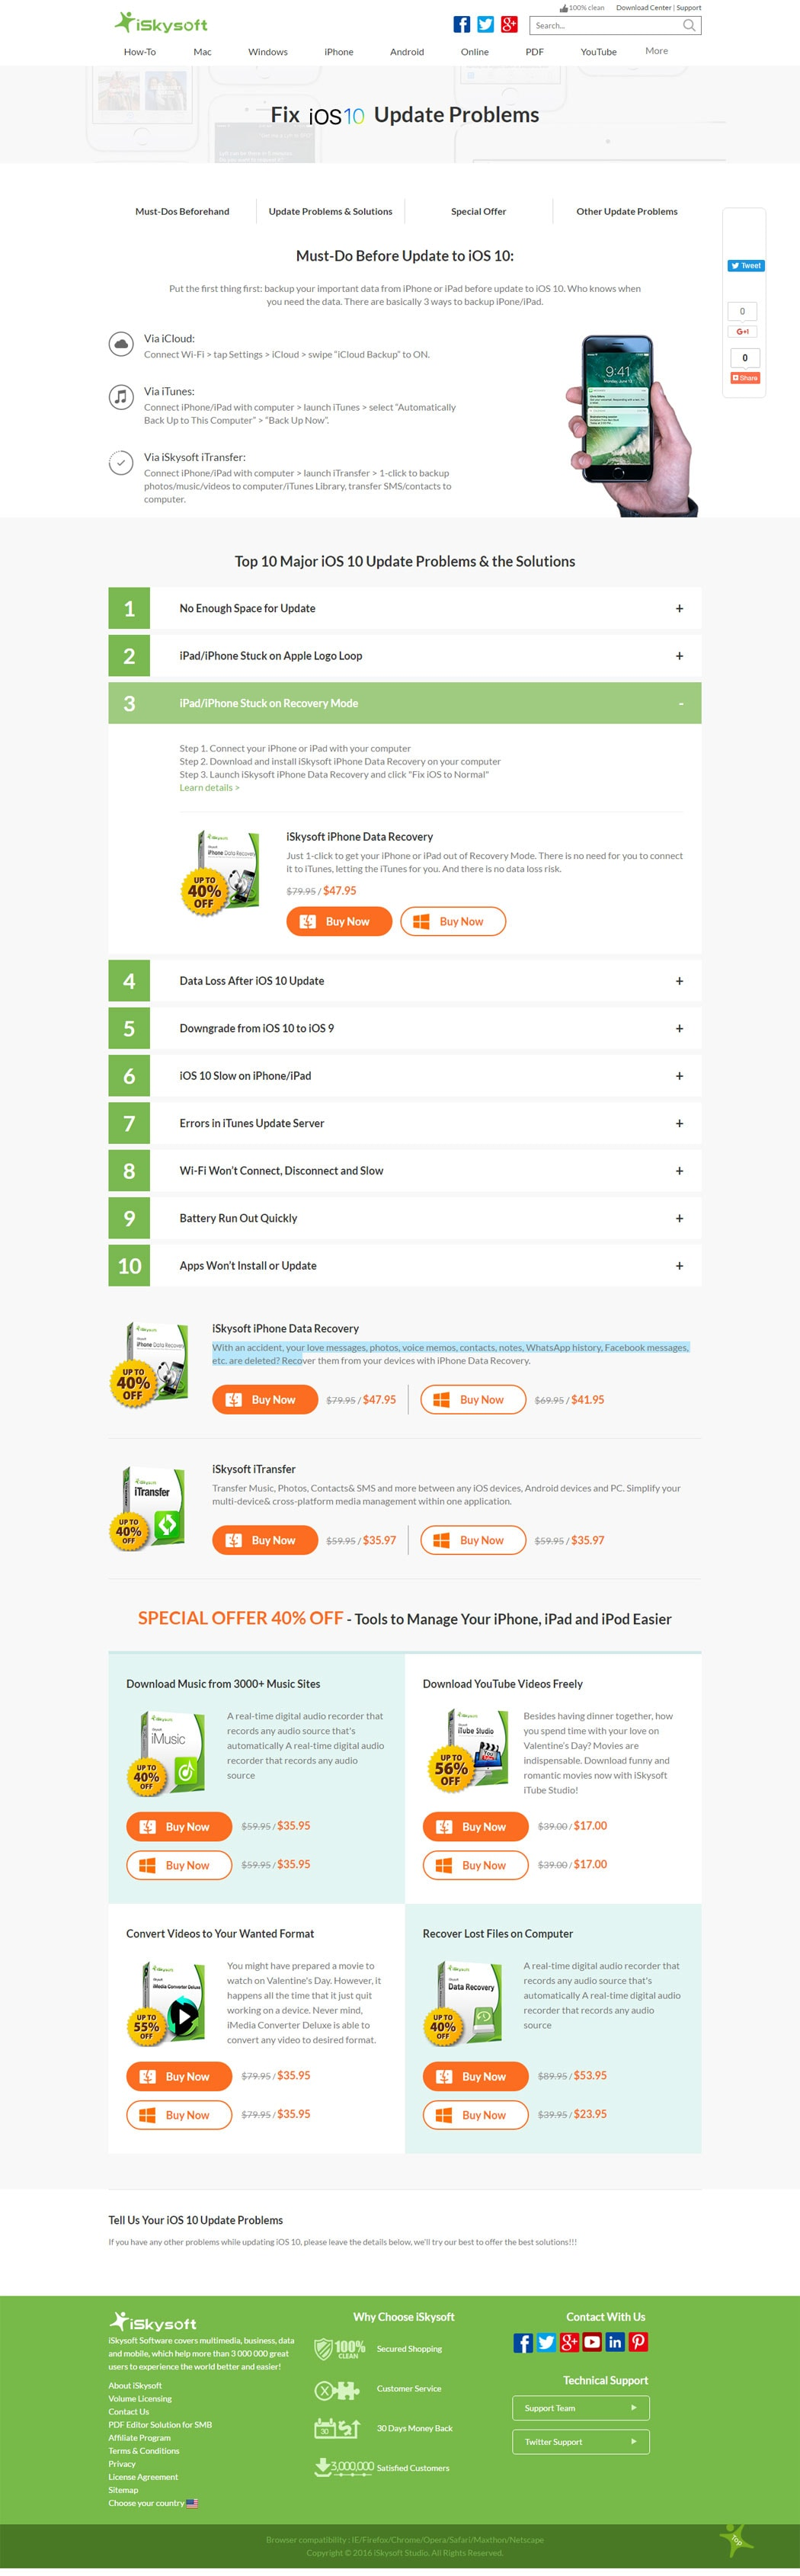 Infographic Ios 10 Upgrade Guide 10 Major Problems